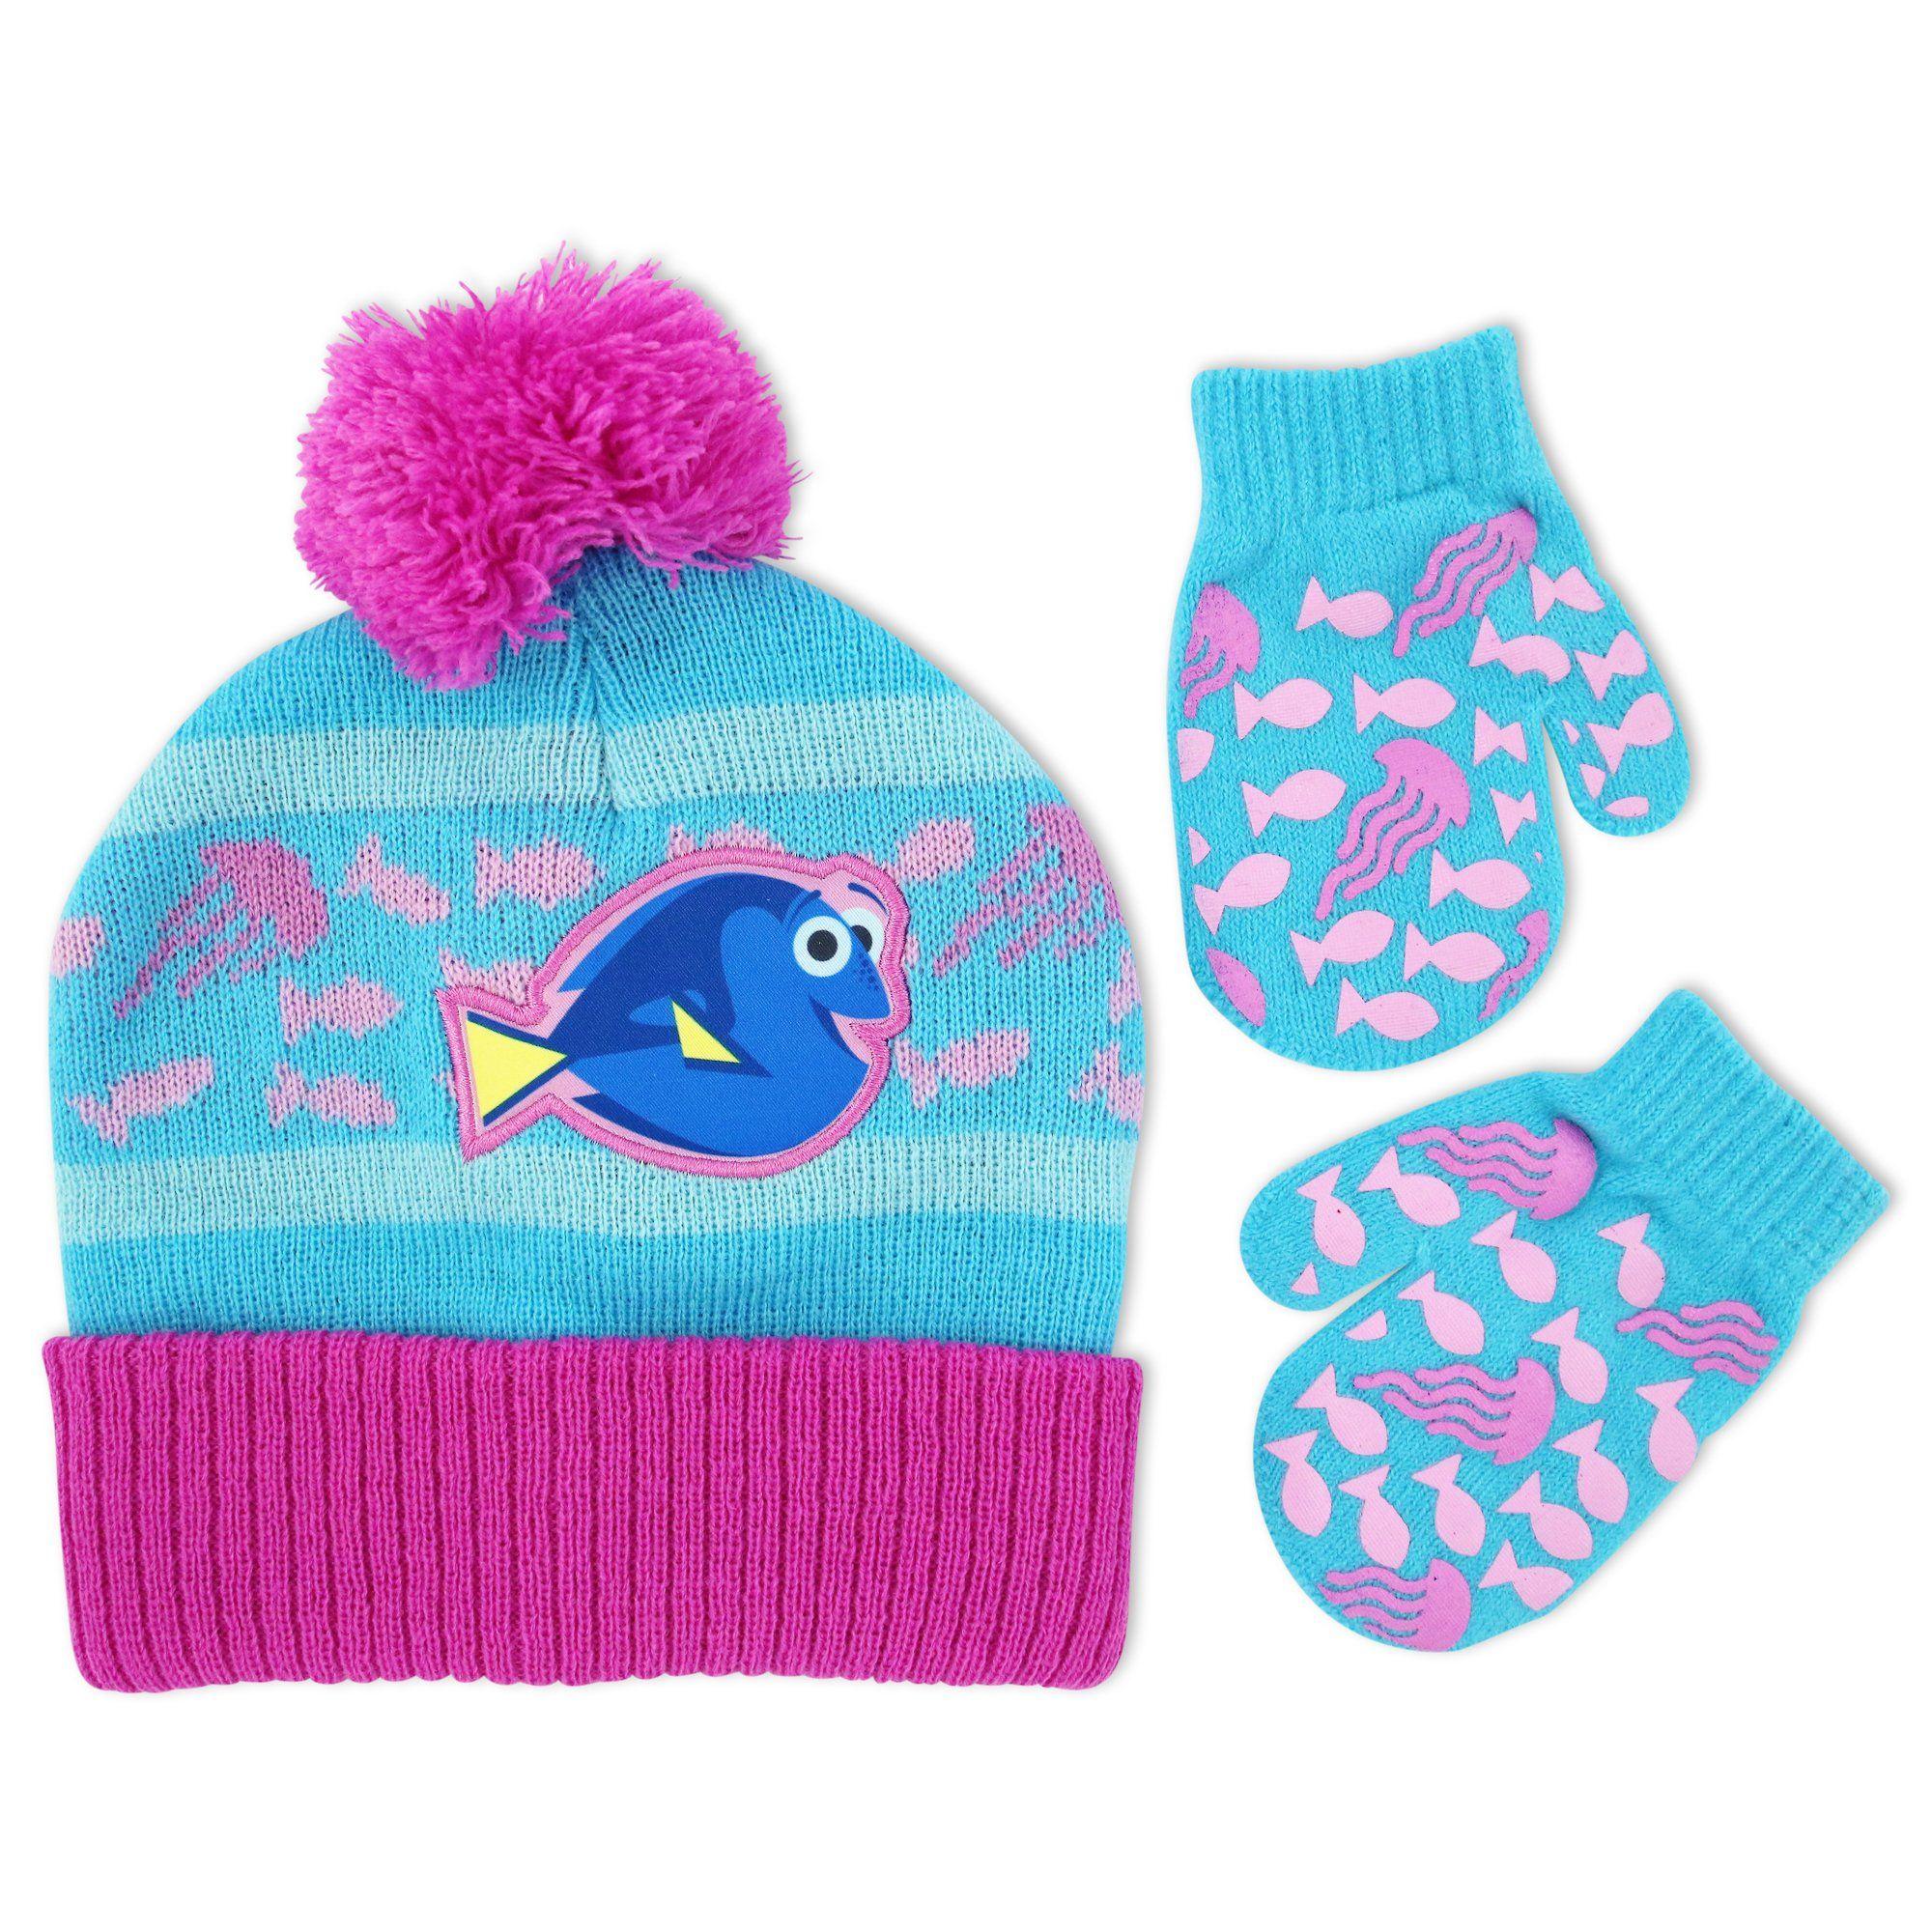 e7c1d703048 Disney Little Girls Finding Dory Hosiery Acrylic Knit Winter Cuffed Beanie  Pom Hat and Matching Mitten Set